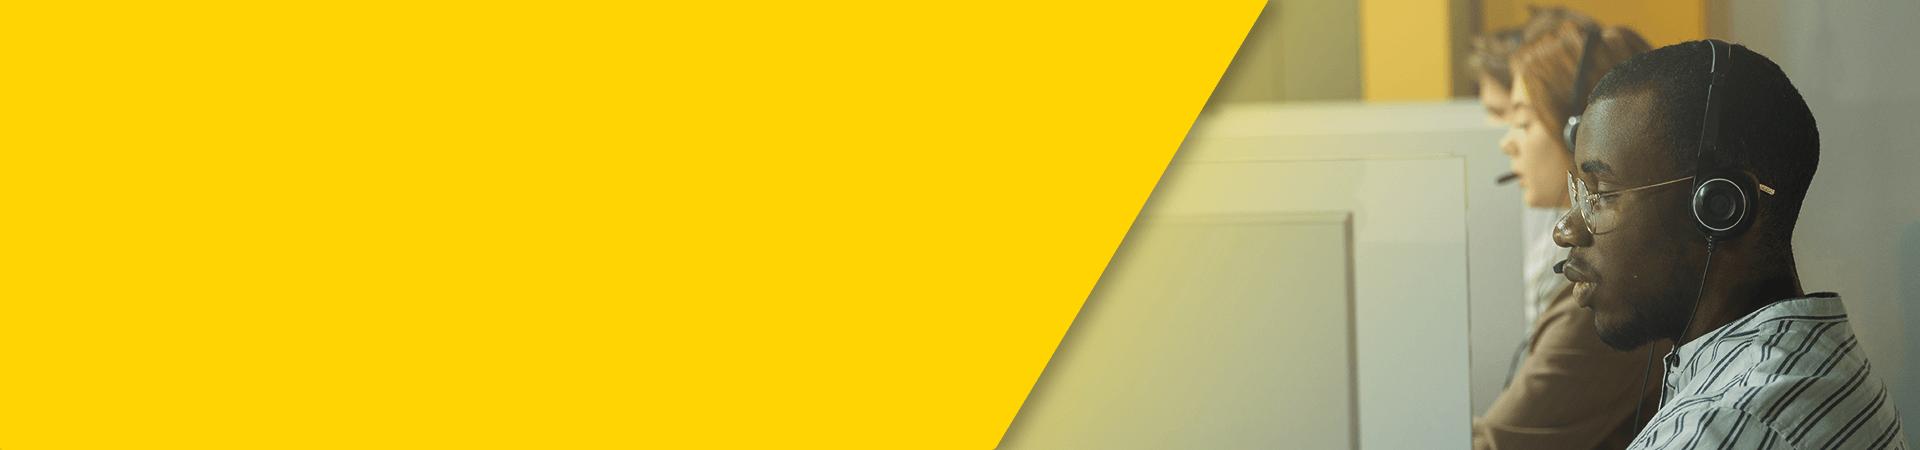 Banner Canal de Denúncias - Desktop